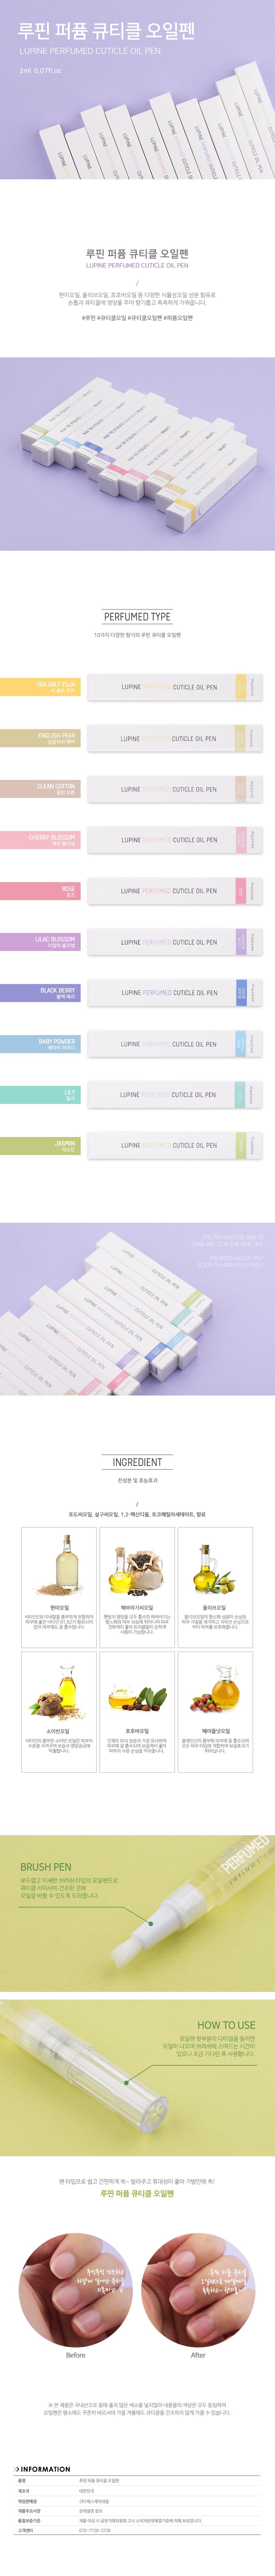 lupine_perfumed_cuticle_oil_pen-10.jpg